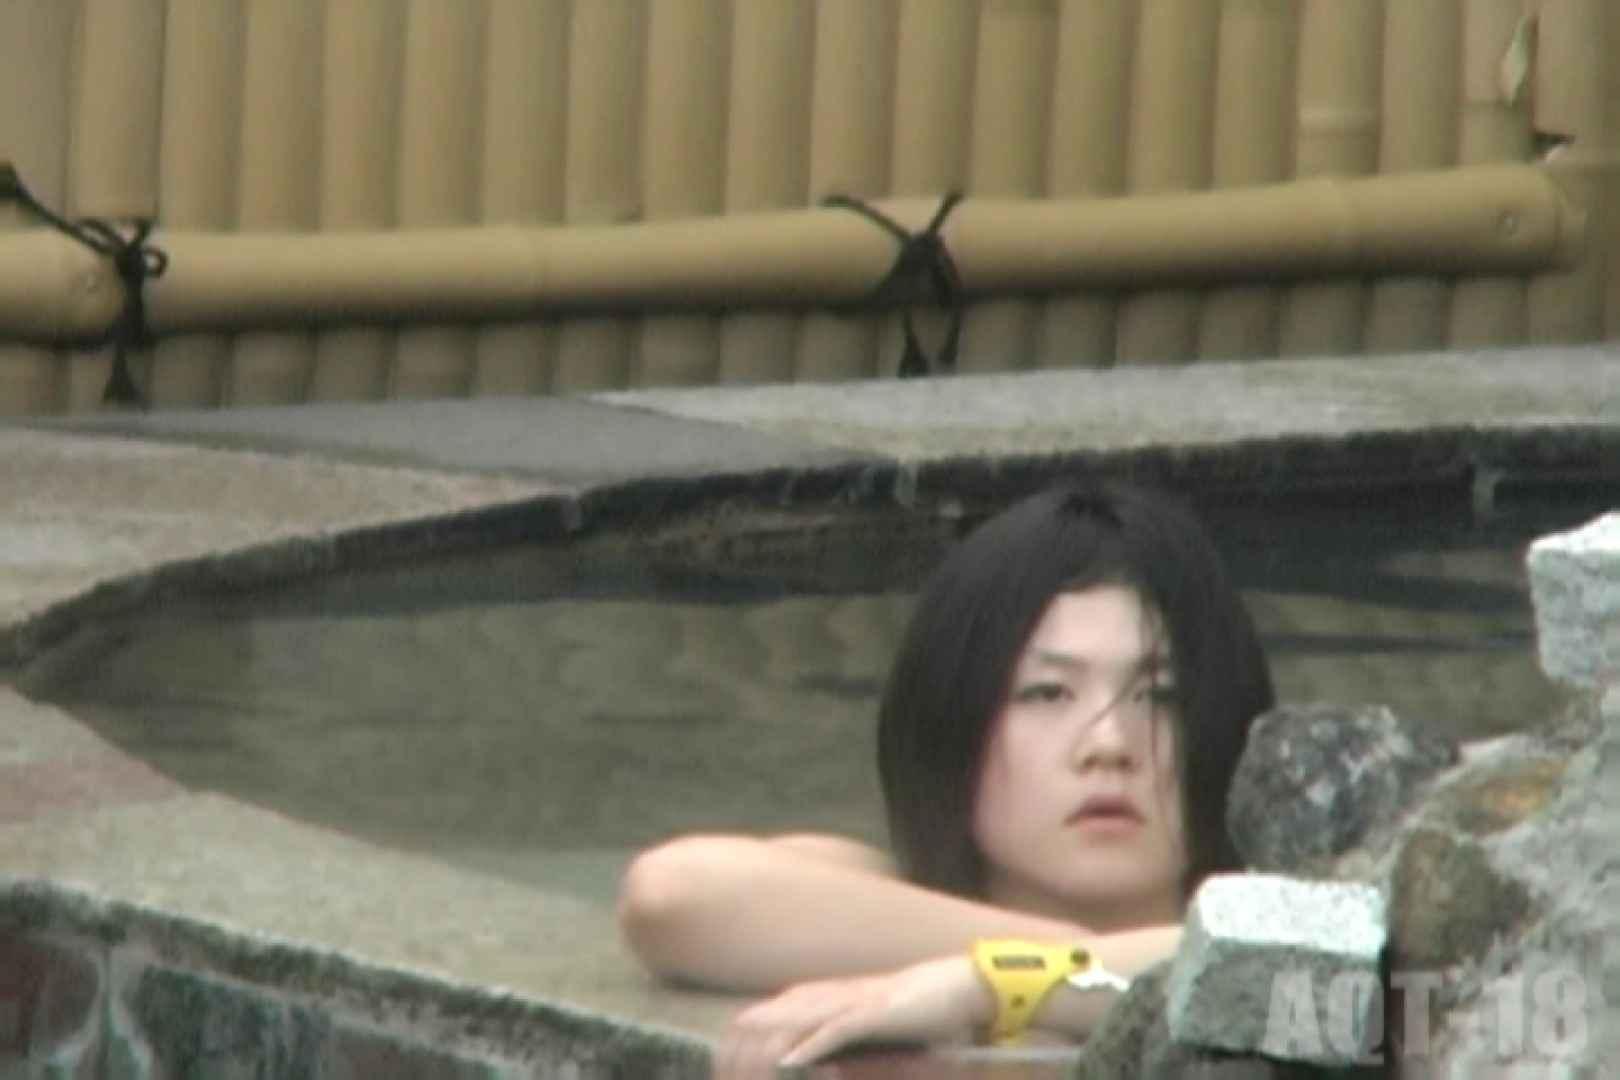 Aquaな露天風呂Vol.859 露天風呂   OLのエロ生活  76連発 22